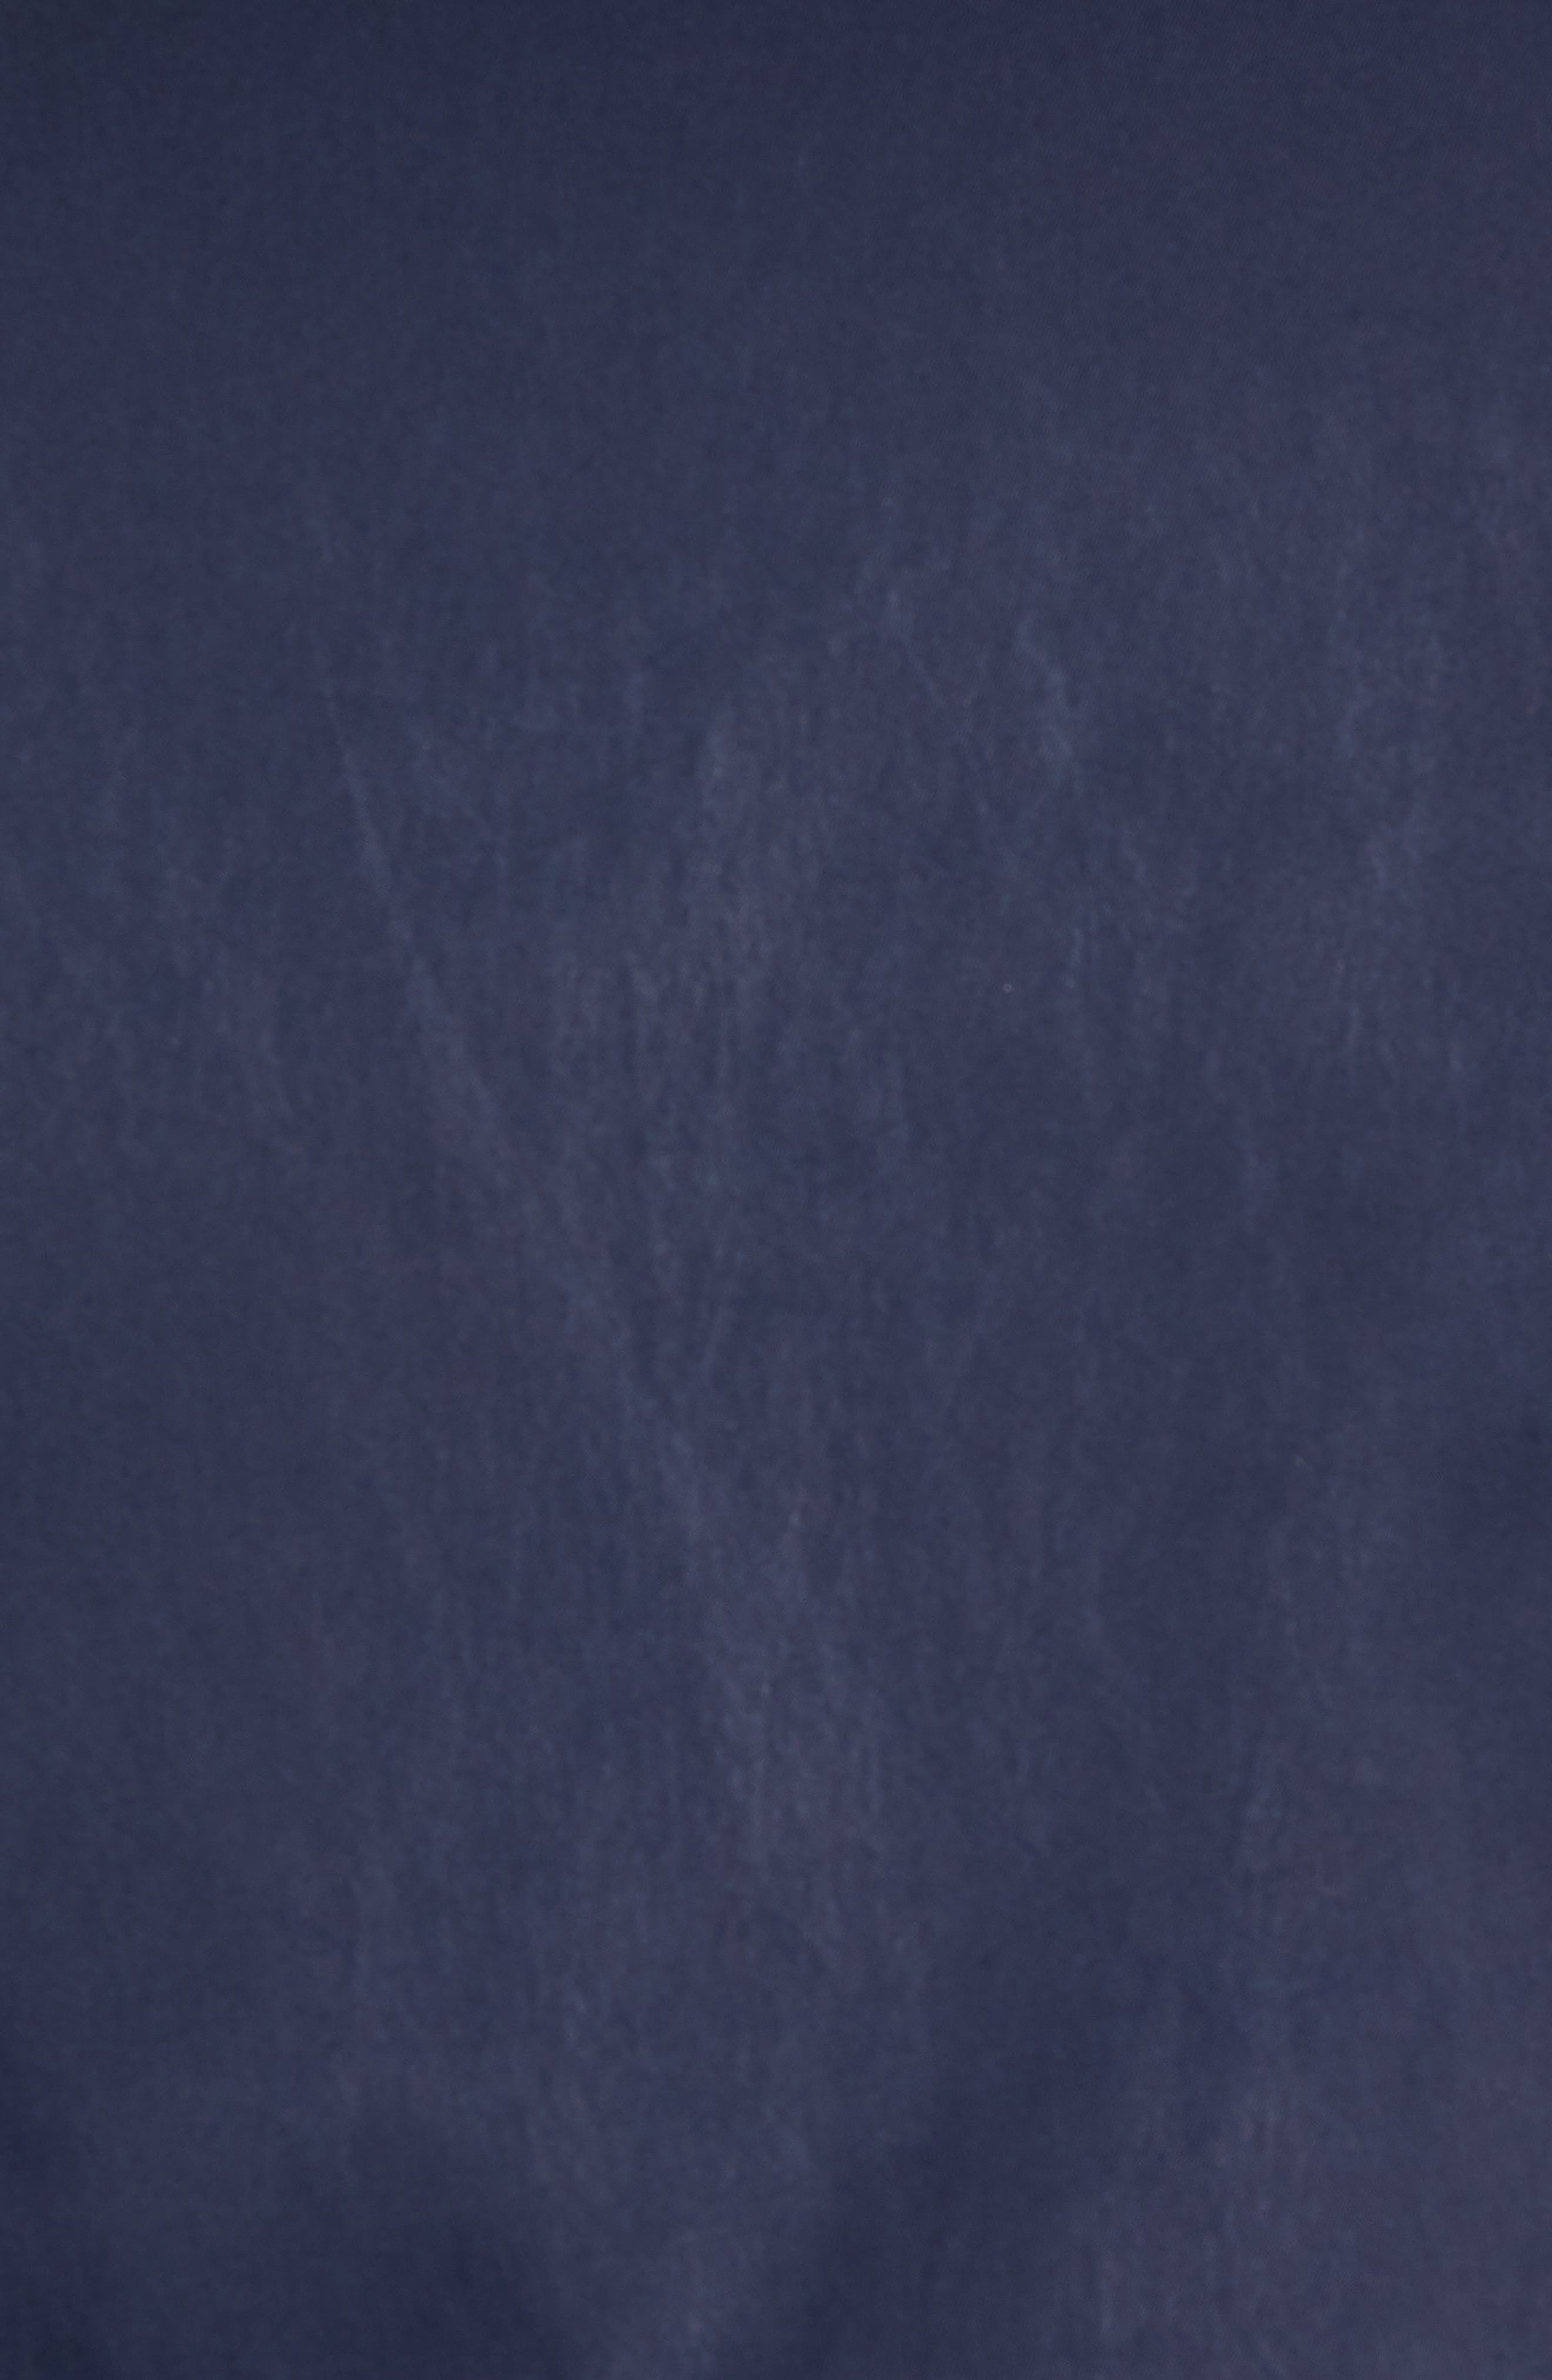 Souvenir Bomber Jacket,                             Alternate thumbnail 5, color,                             Embroidered Palm - Navy